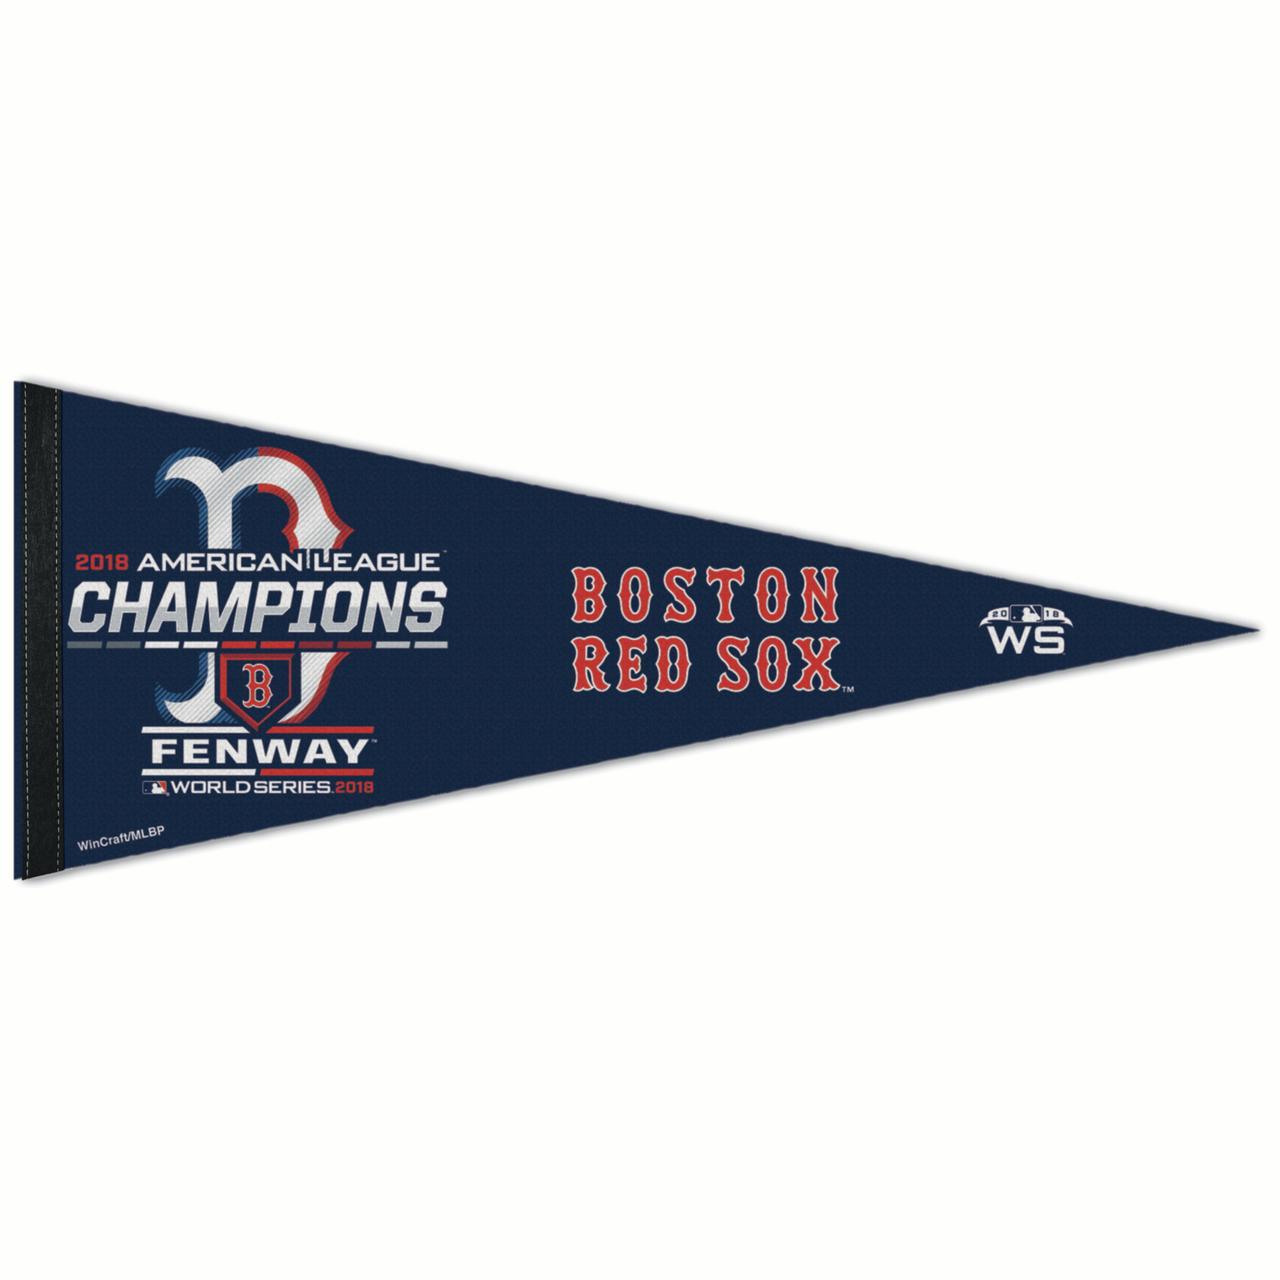 "Boston Red Sox WinCraft 2018 American League Champions On-Field Locker Room Celebration 12"" x 30"" Pennant - No Size"